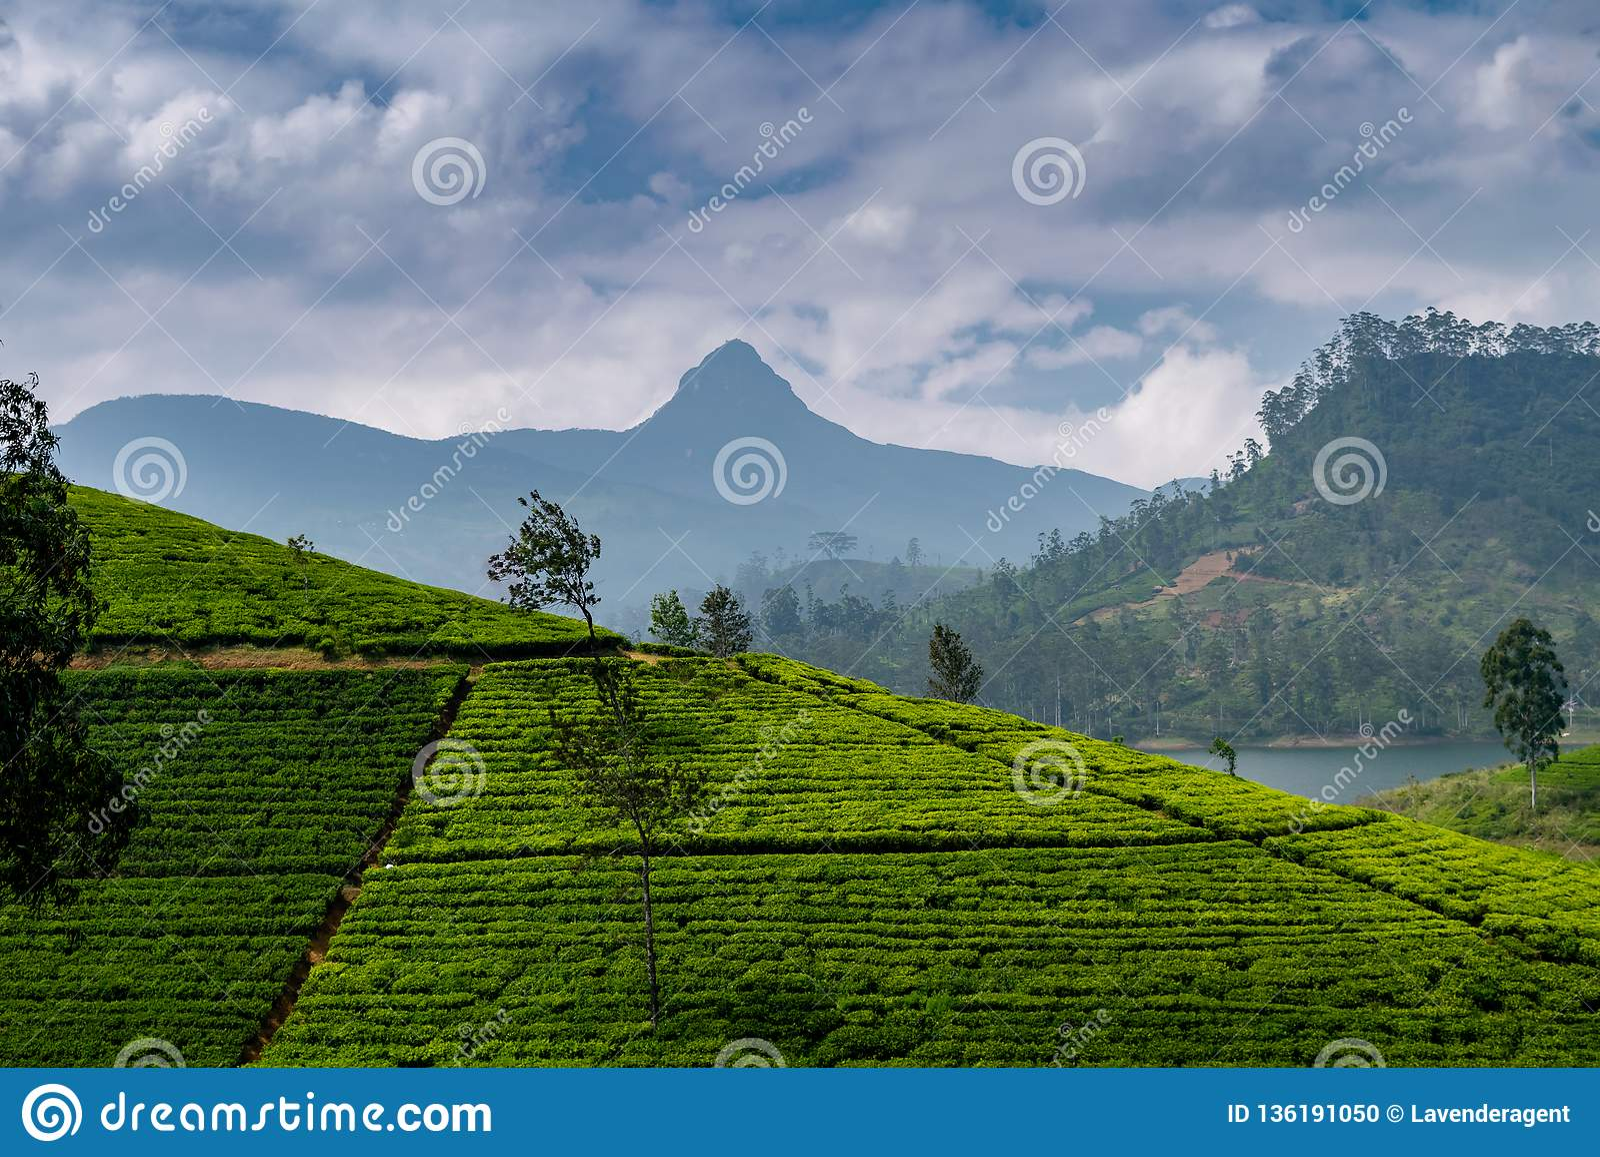 Panorama van theeaanplanting met Adams piek, Sri Lanka